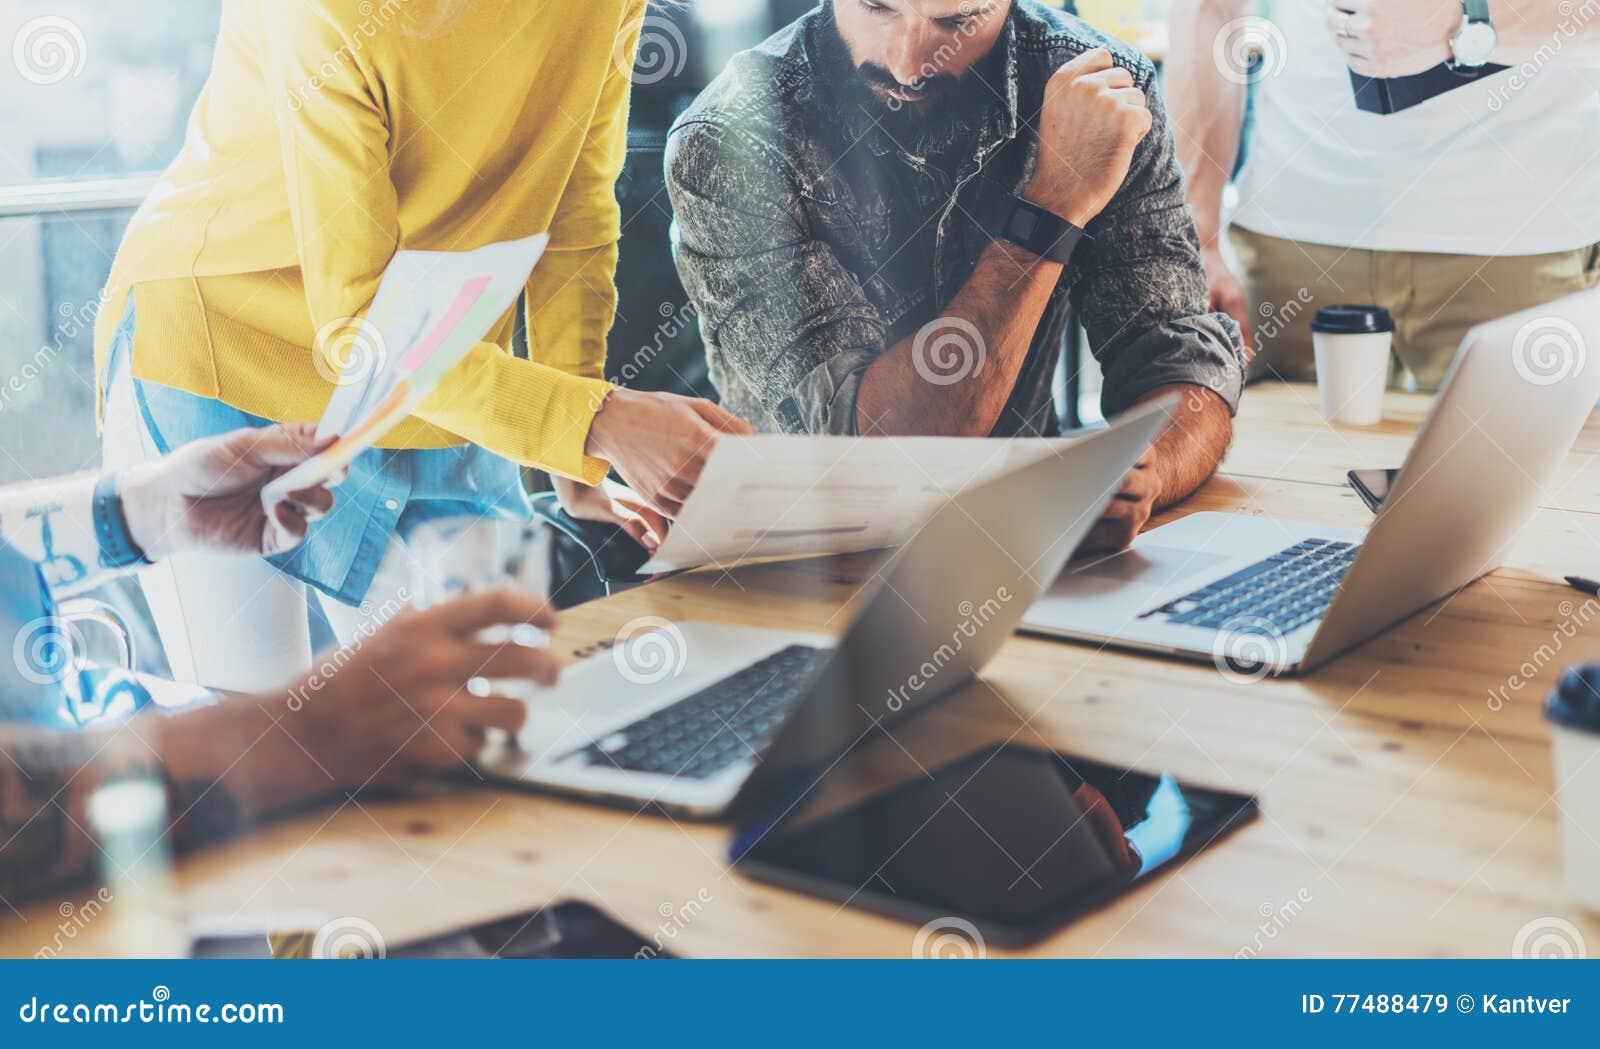 Teamwork Concept.Coworkers Team Brainstorming During Work Process Modern Loft Near Window.Business Startup Project.Woman